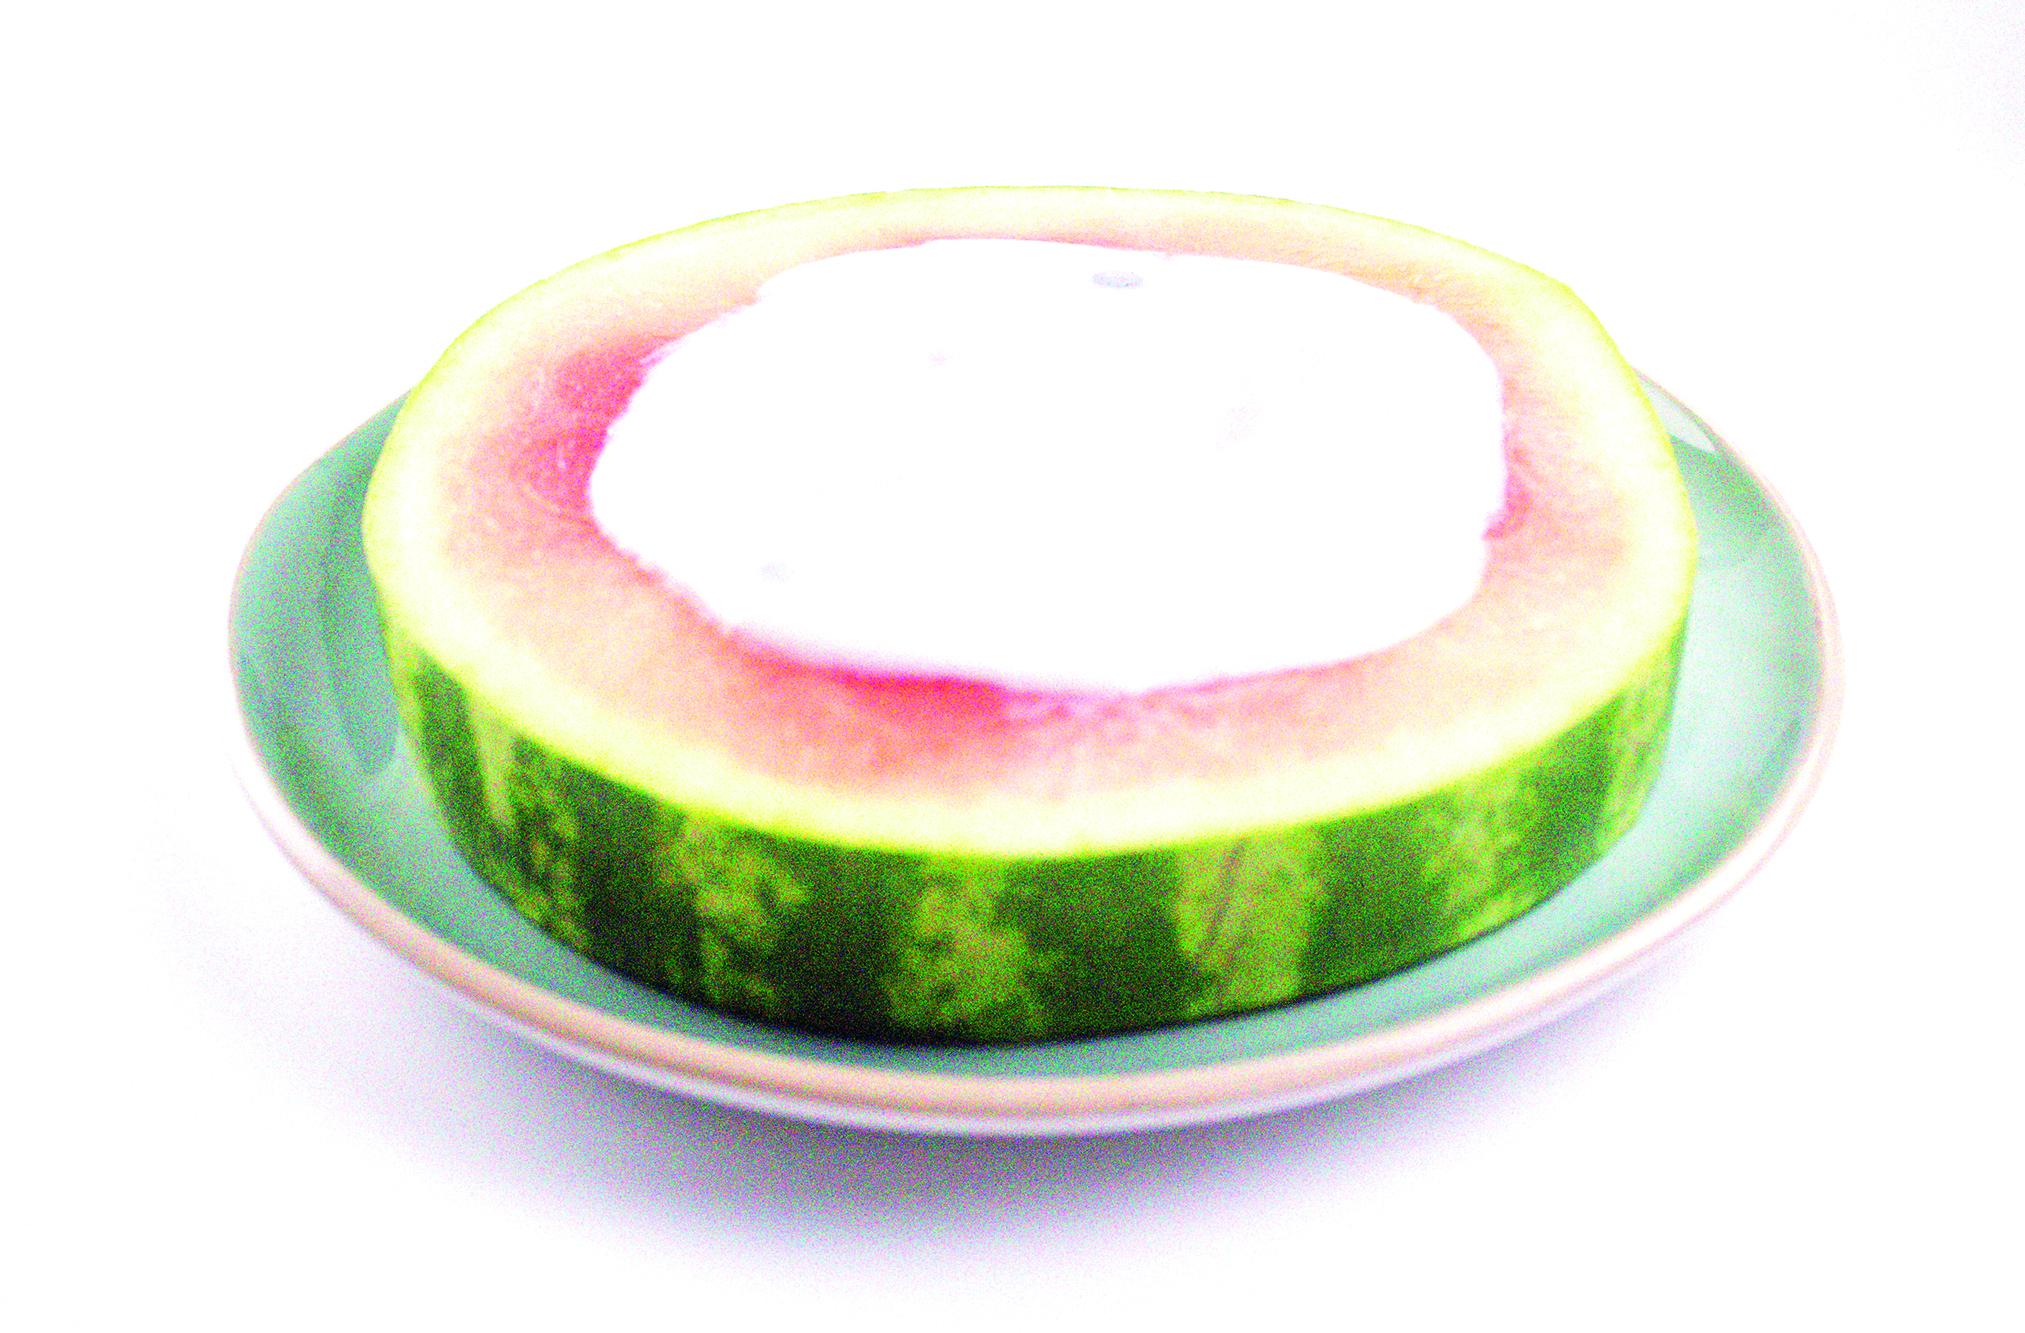 Watermelon and yoghurt